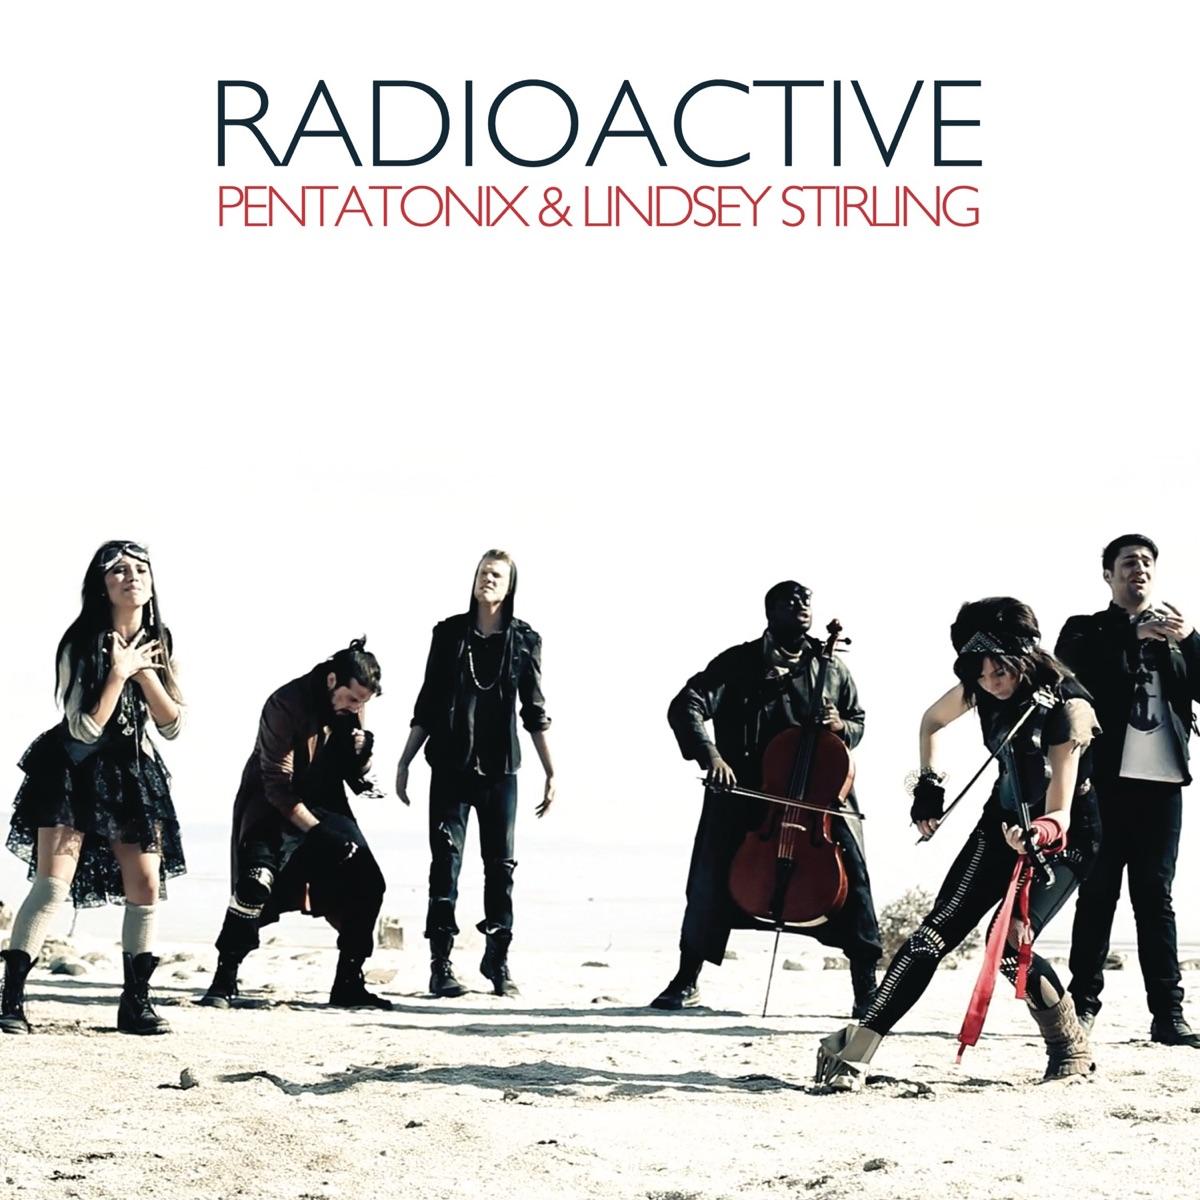 Radioactive - Single Pentatonix  Lindsey Stirling CD cover